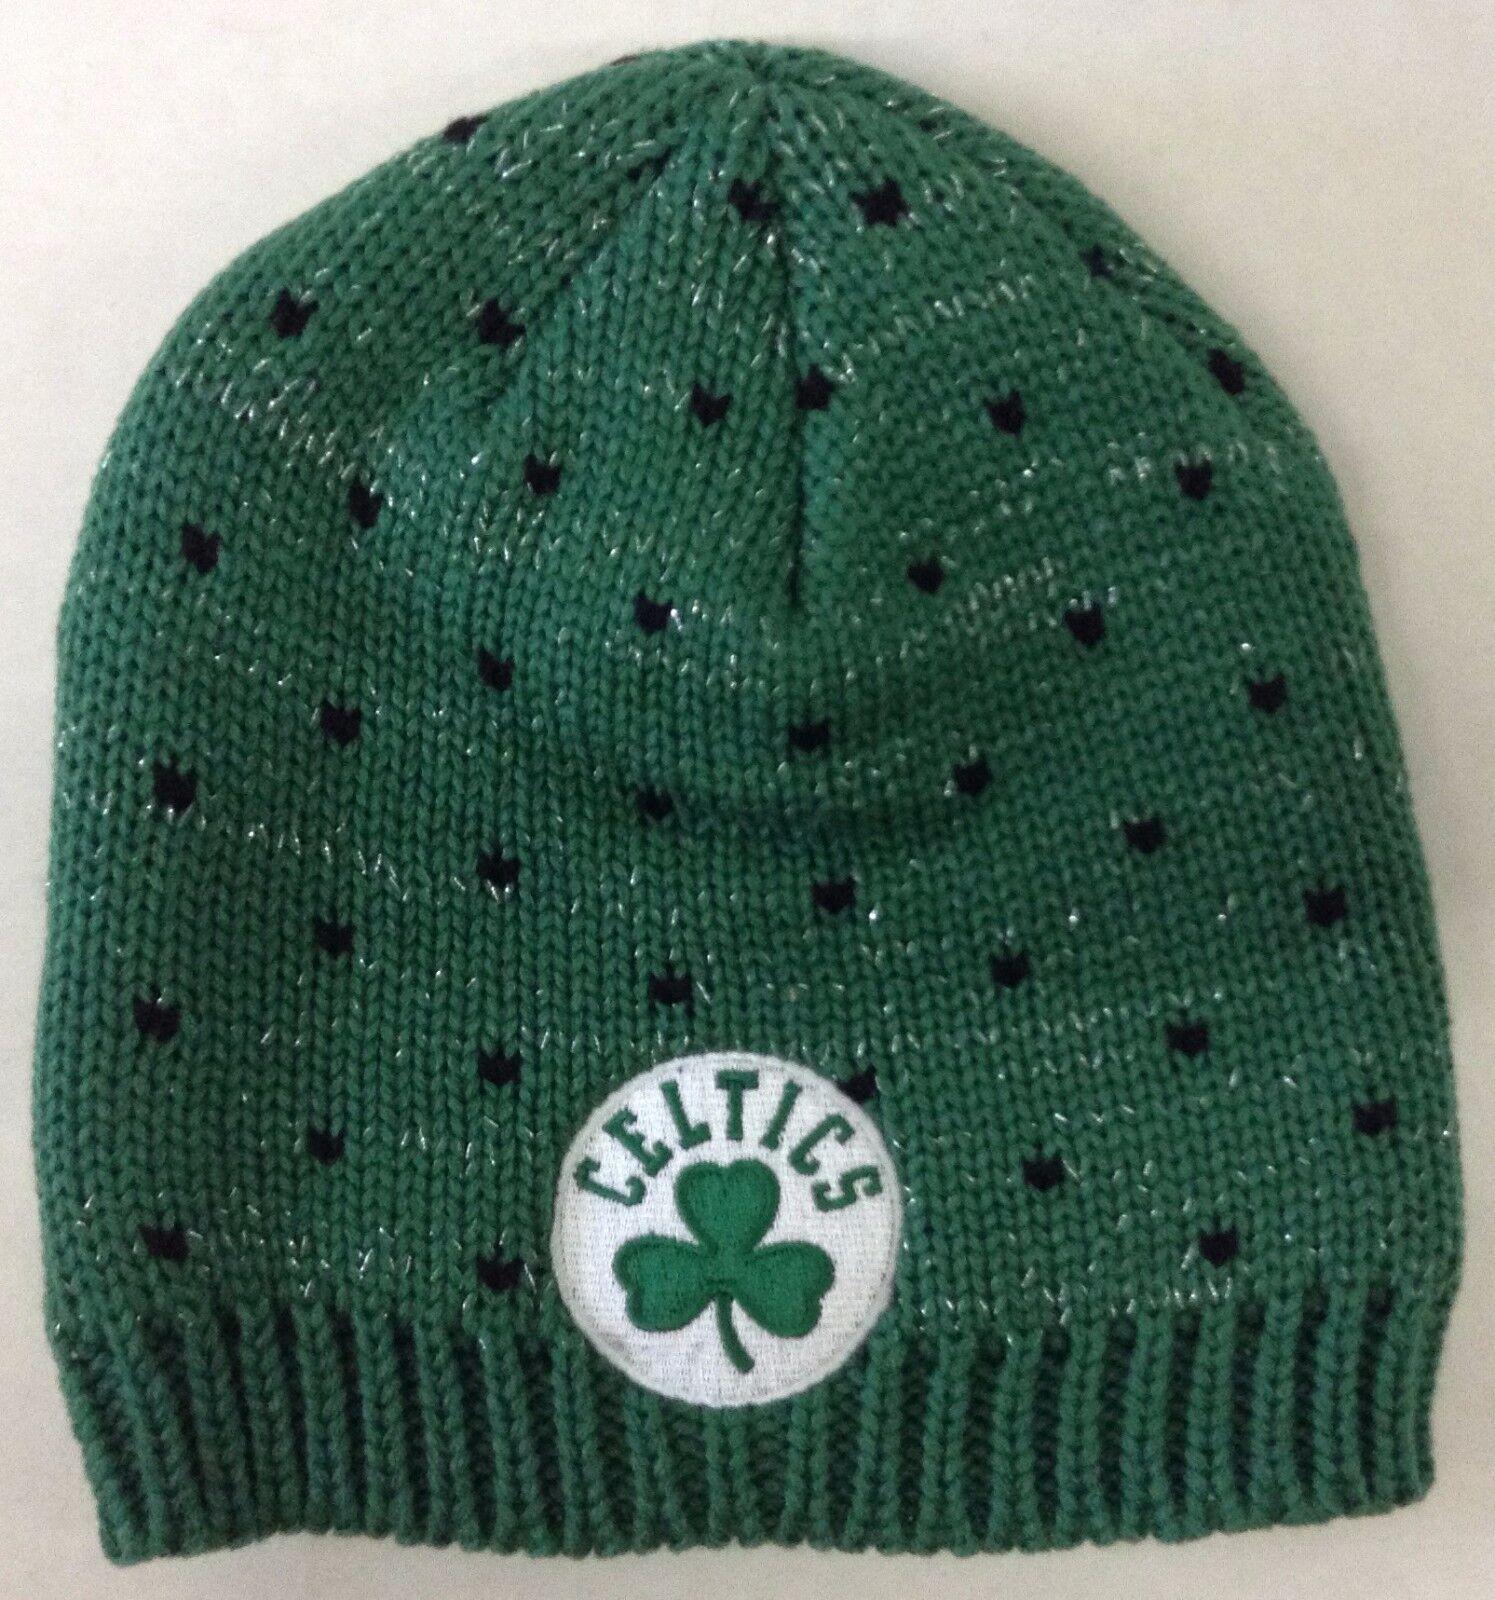 Gorra tejida de invierno para mujer Adidas de NBA Boston Celtics Beanie Style # KU68W ¡NUEVO!